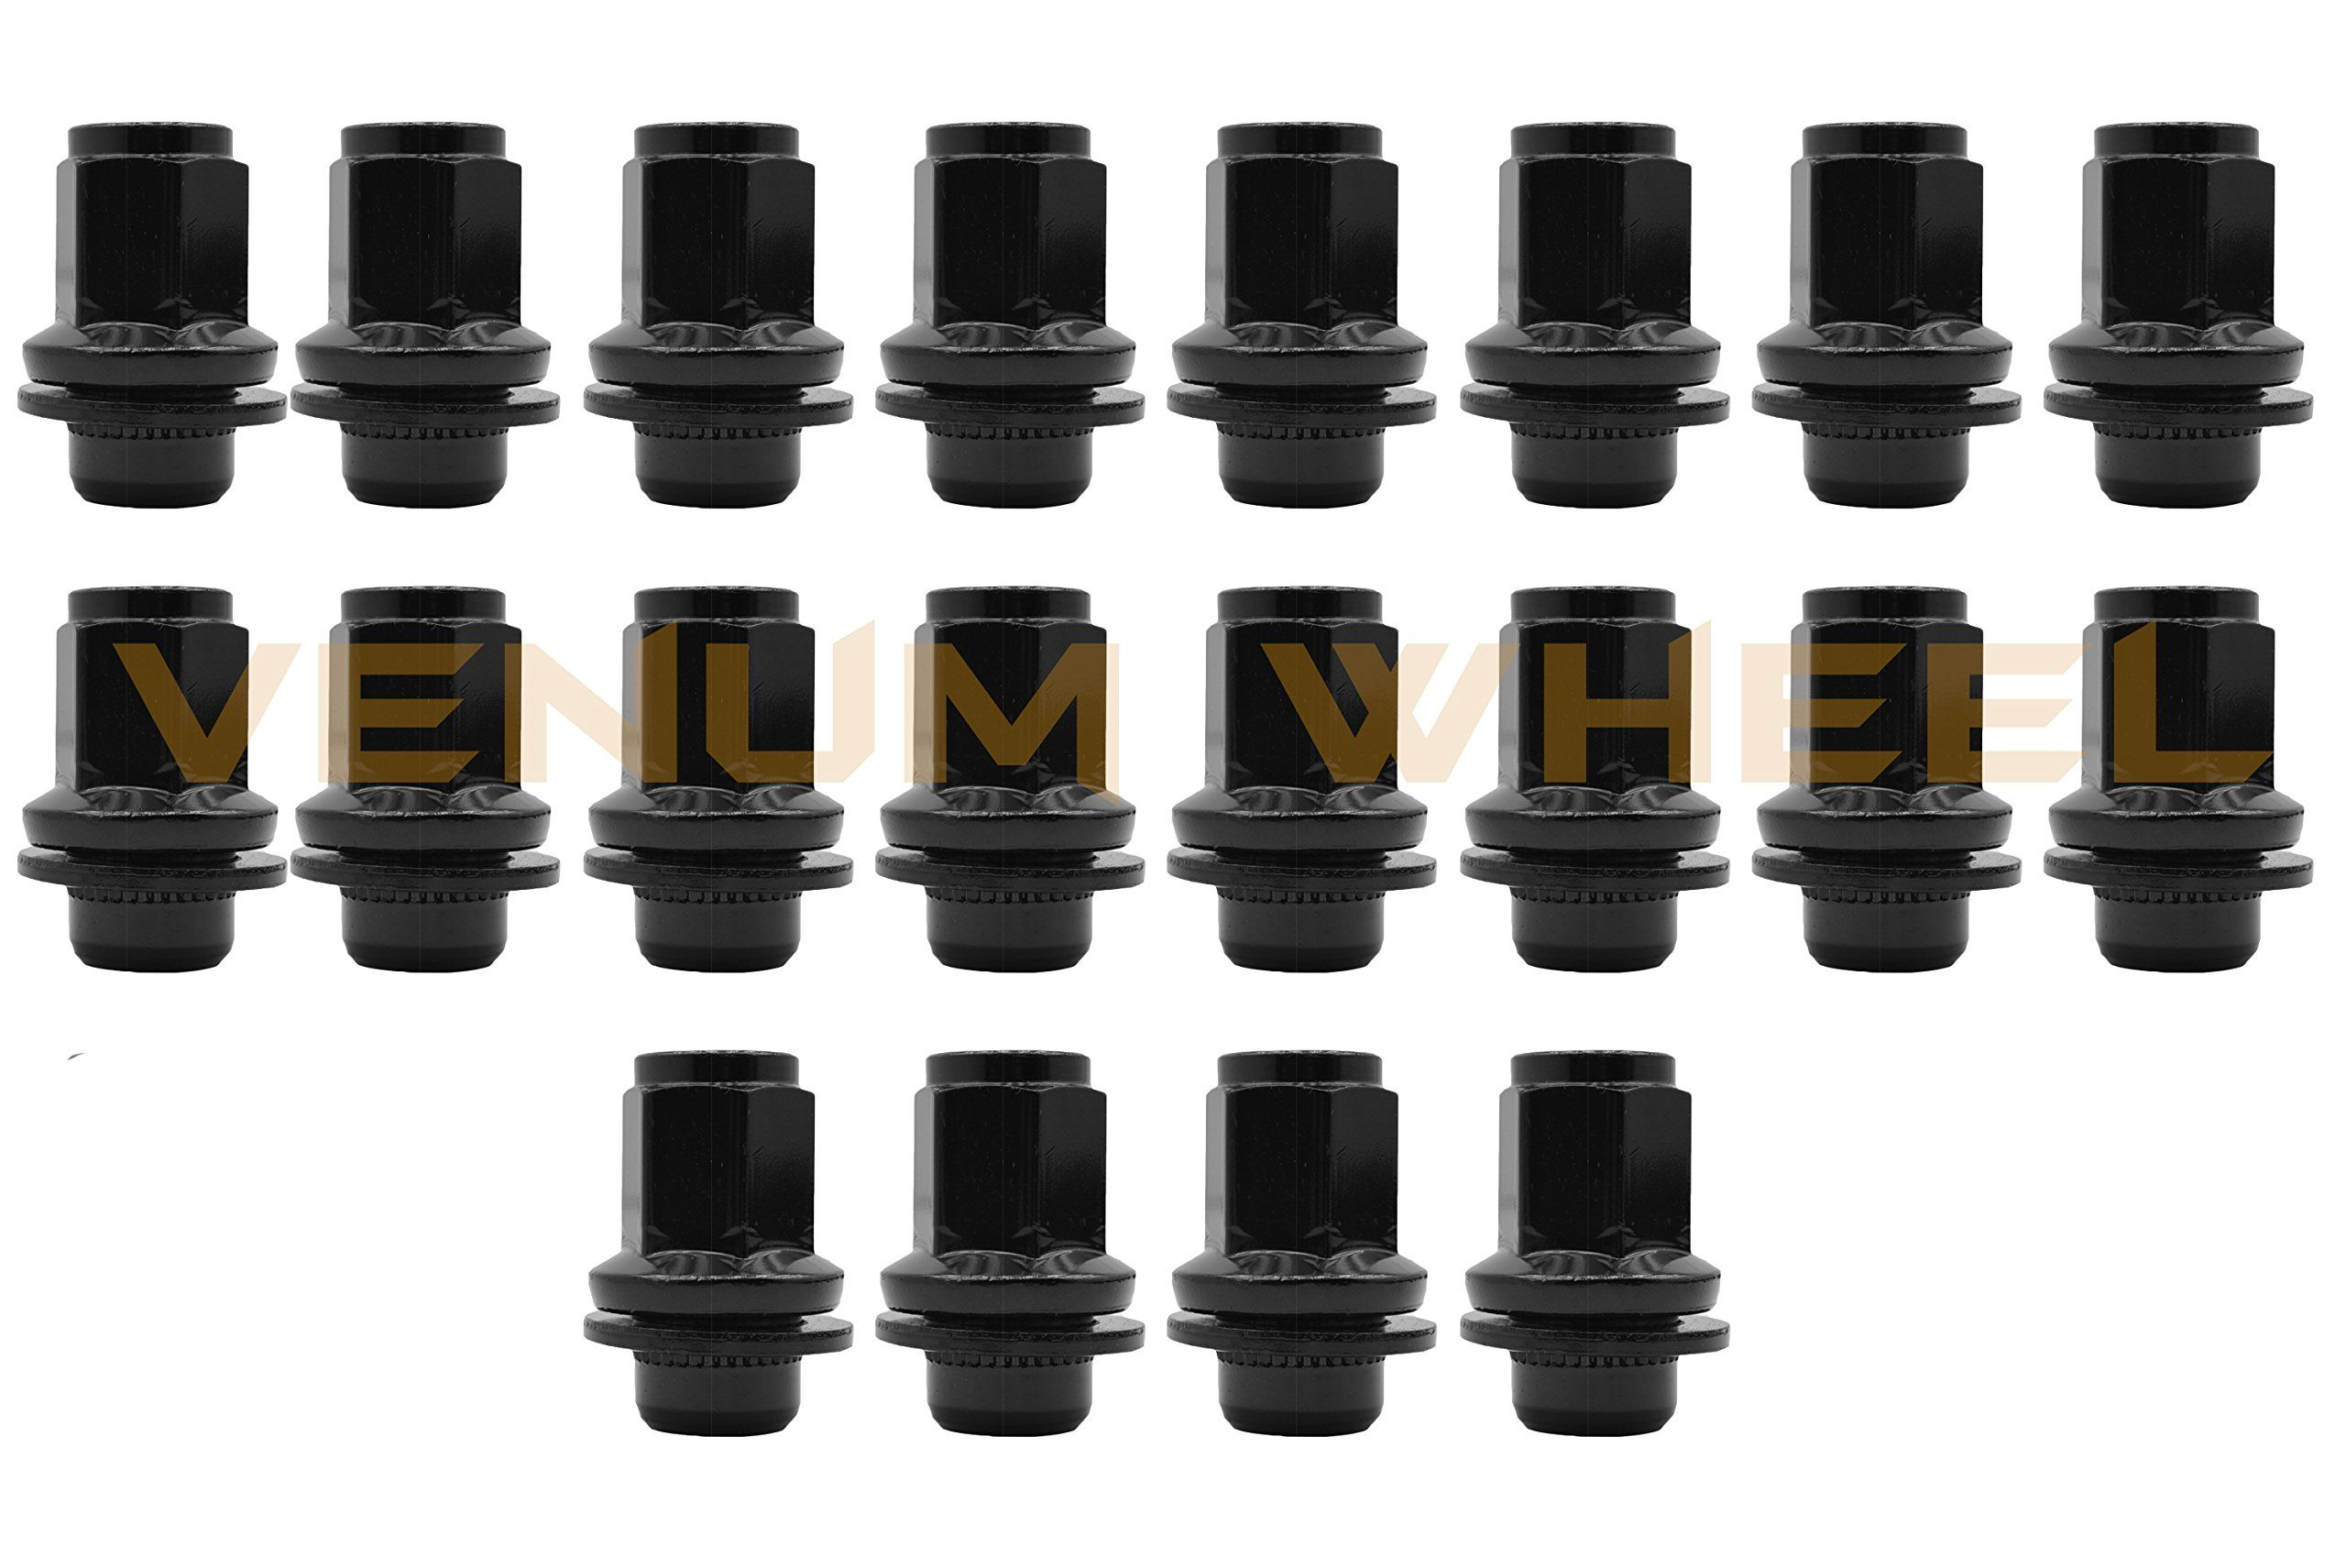 Sickspeed 16 Black//Polished Spiked Aluminum 60Mm Extended Tuner Lug Nuts Wheels 12X1.5 L16 for Mazda Miata